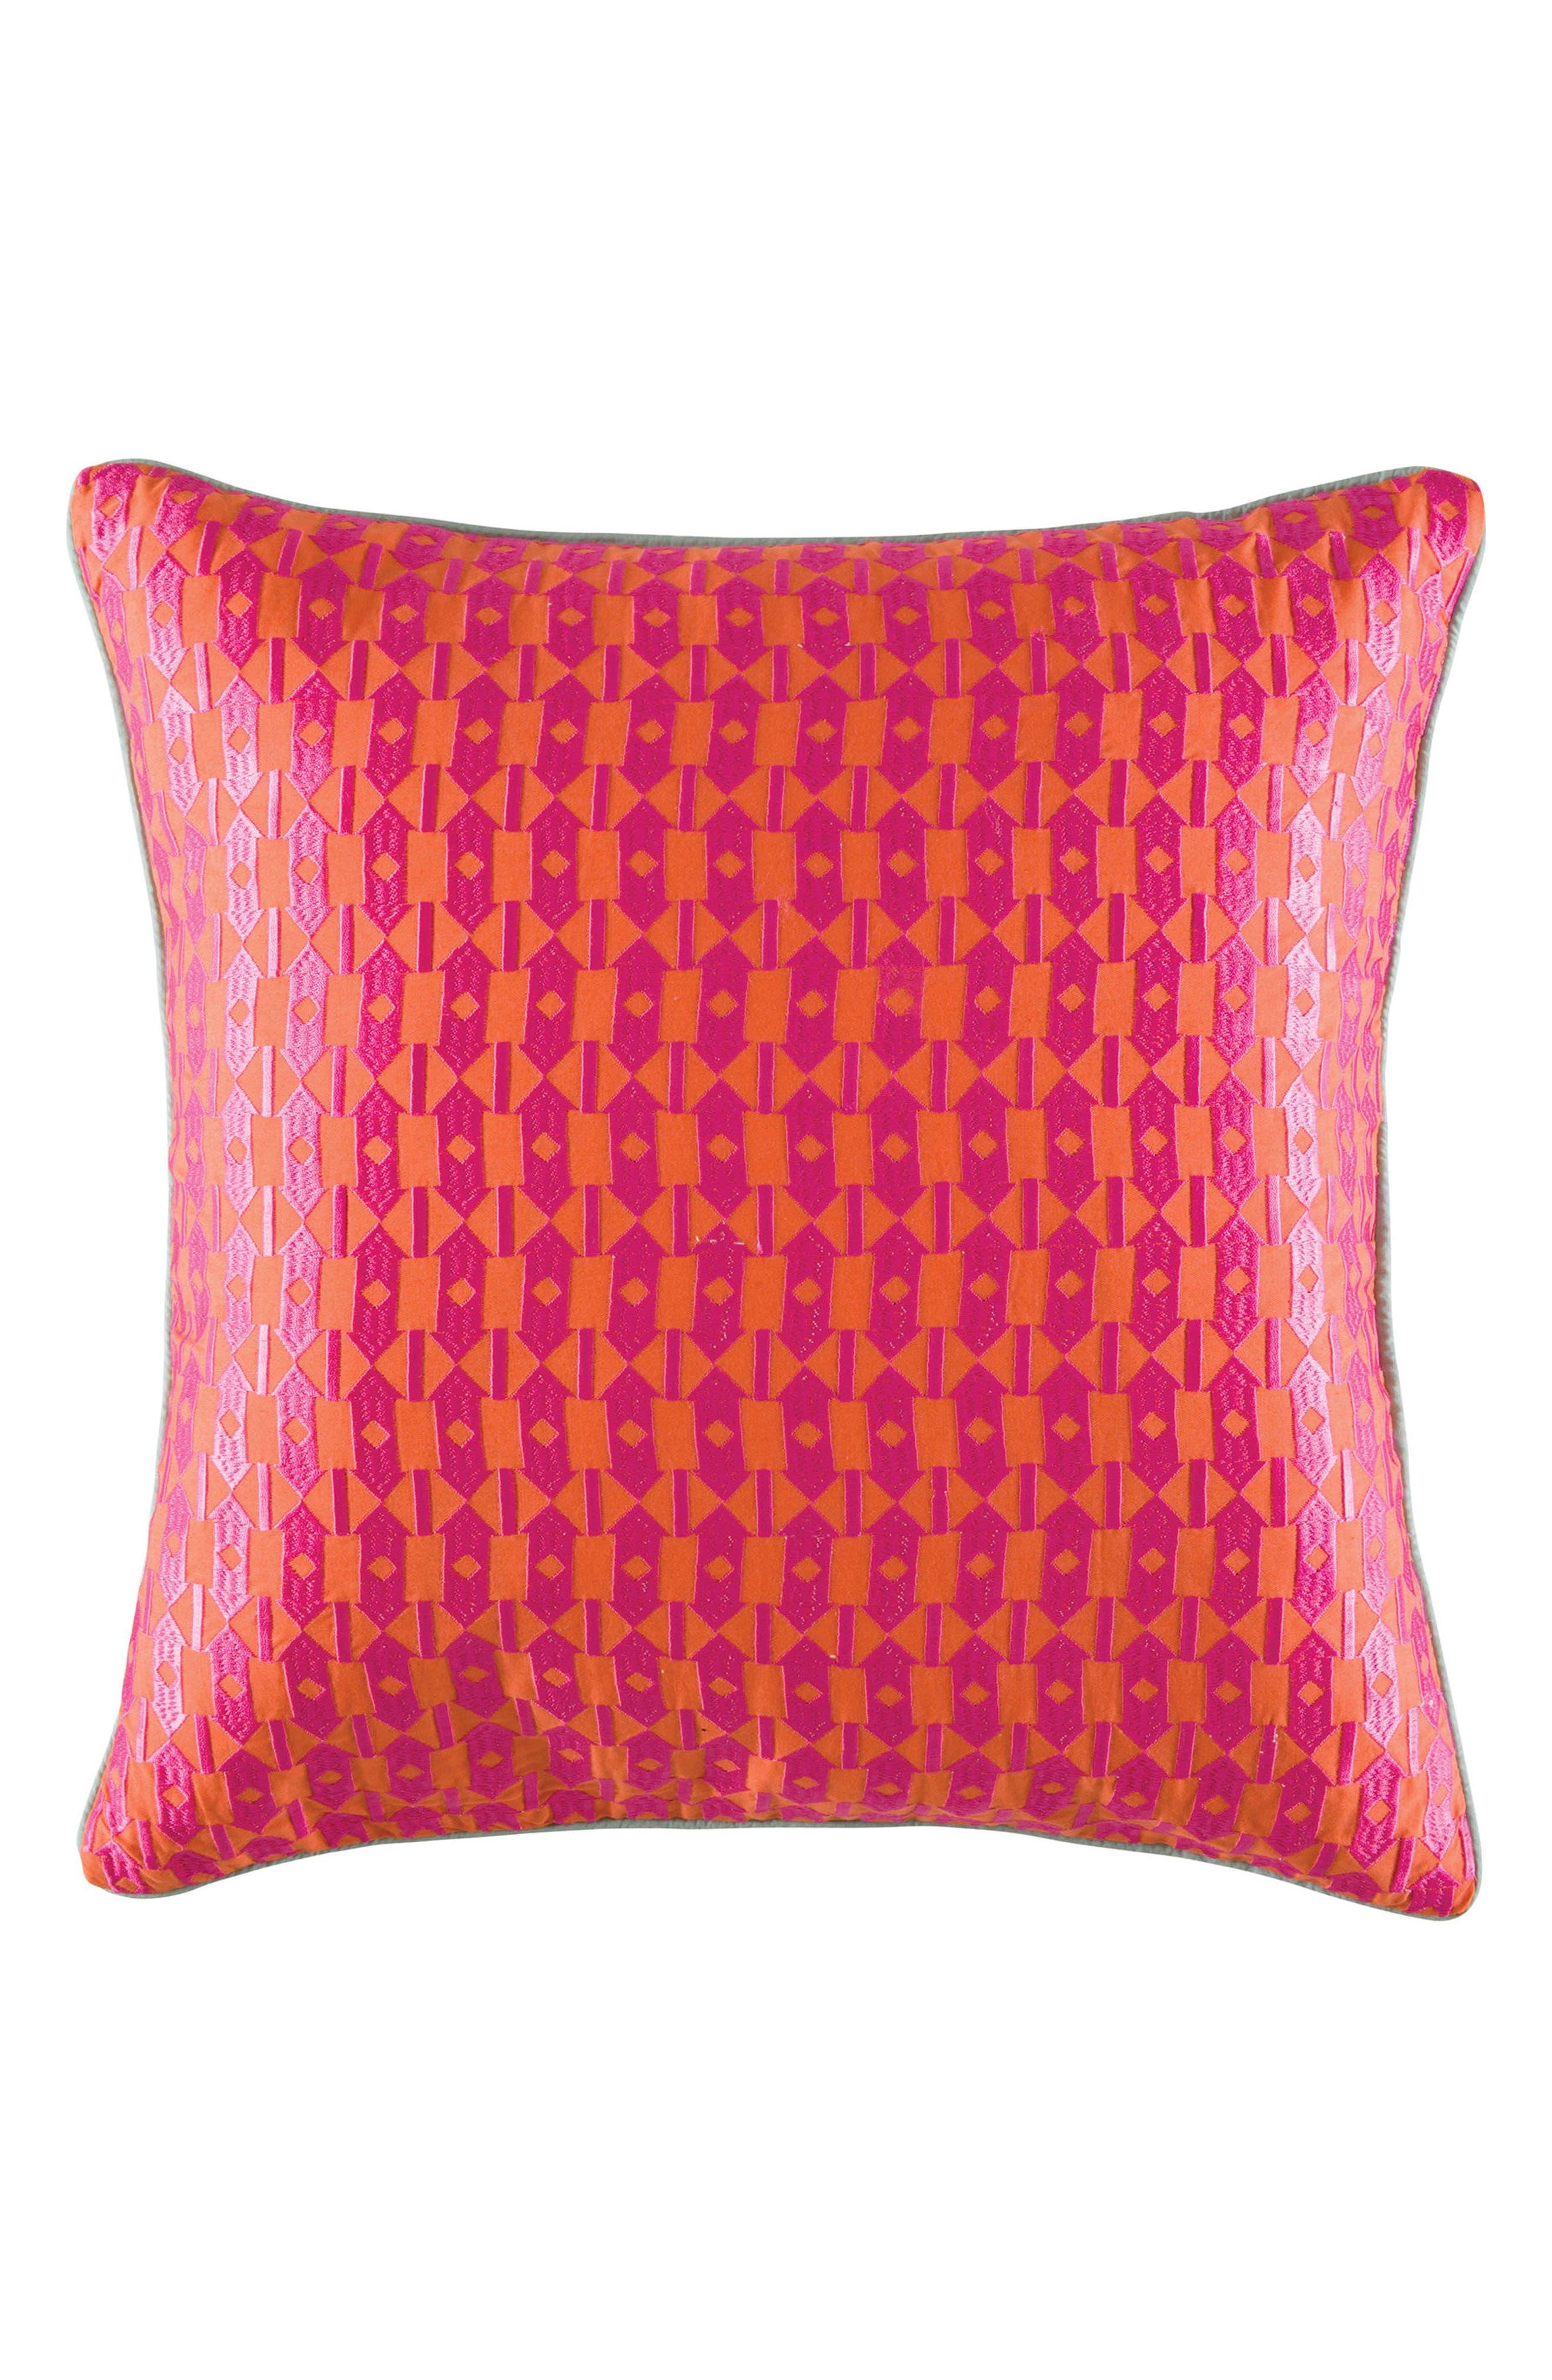 Main Image - KAS Designs Grenda Pillow